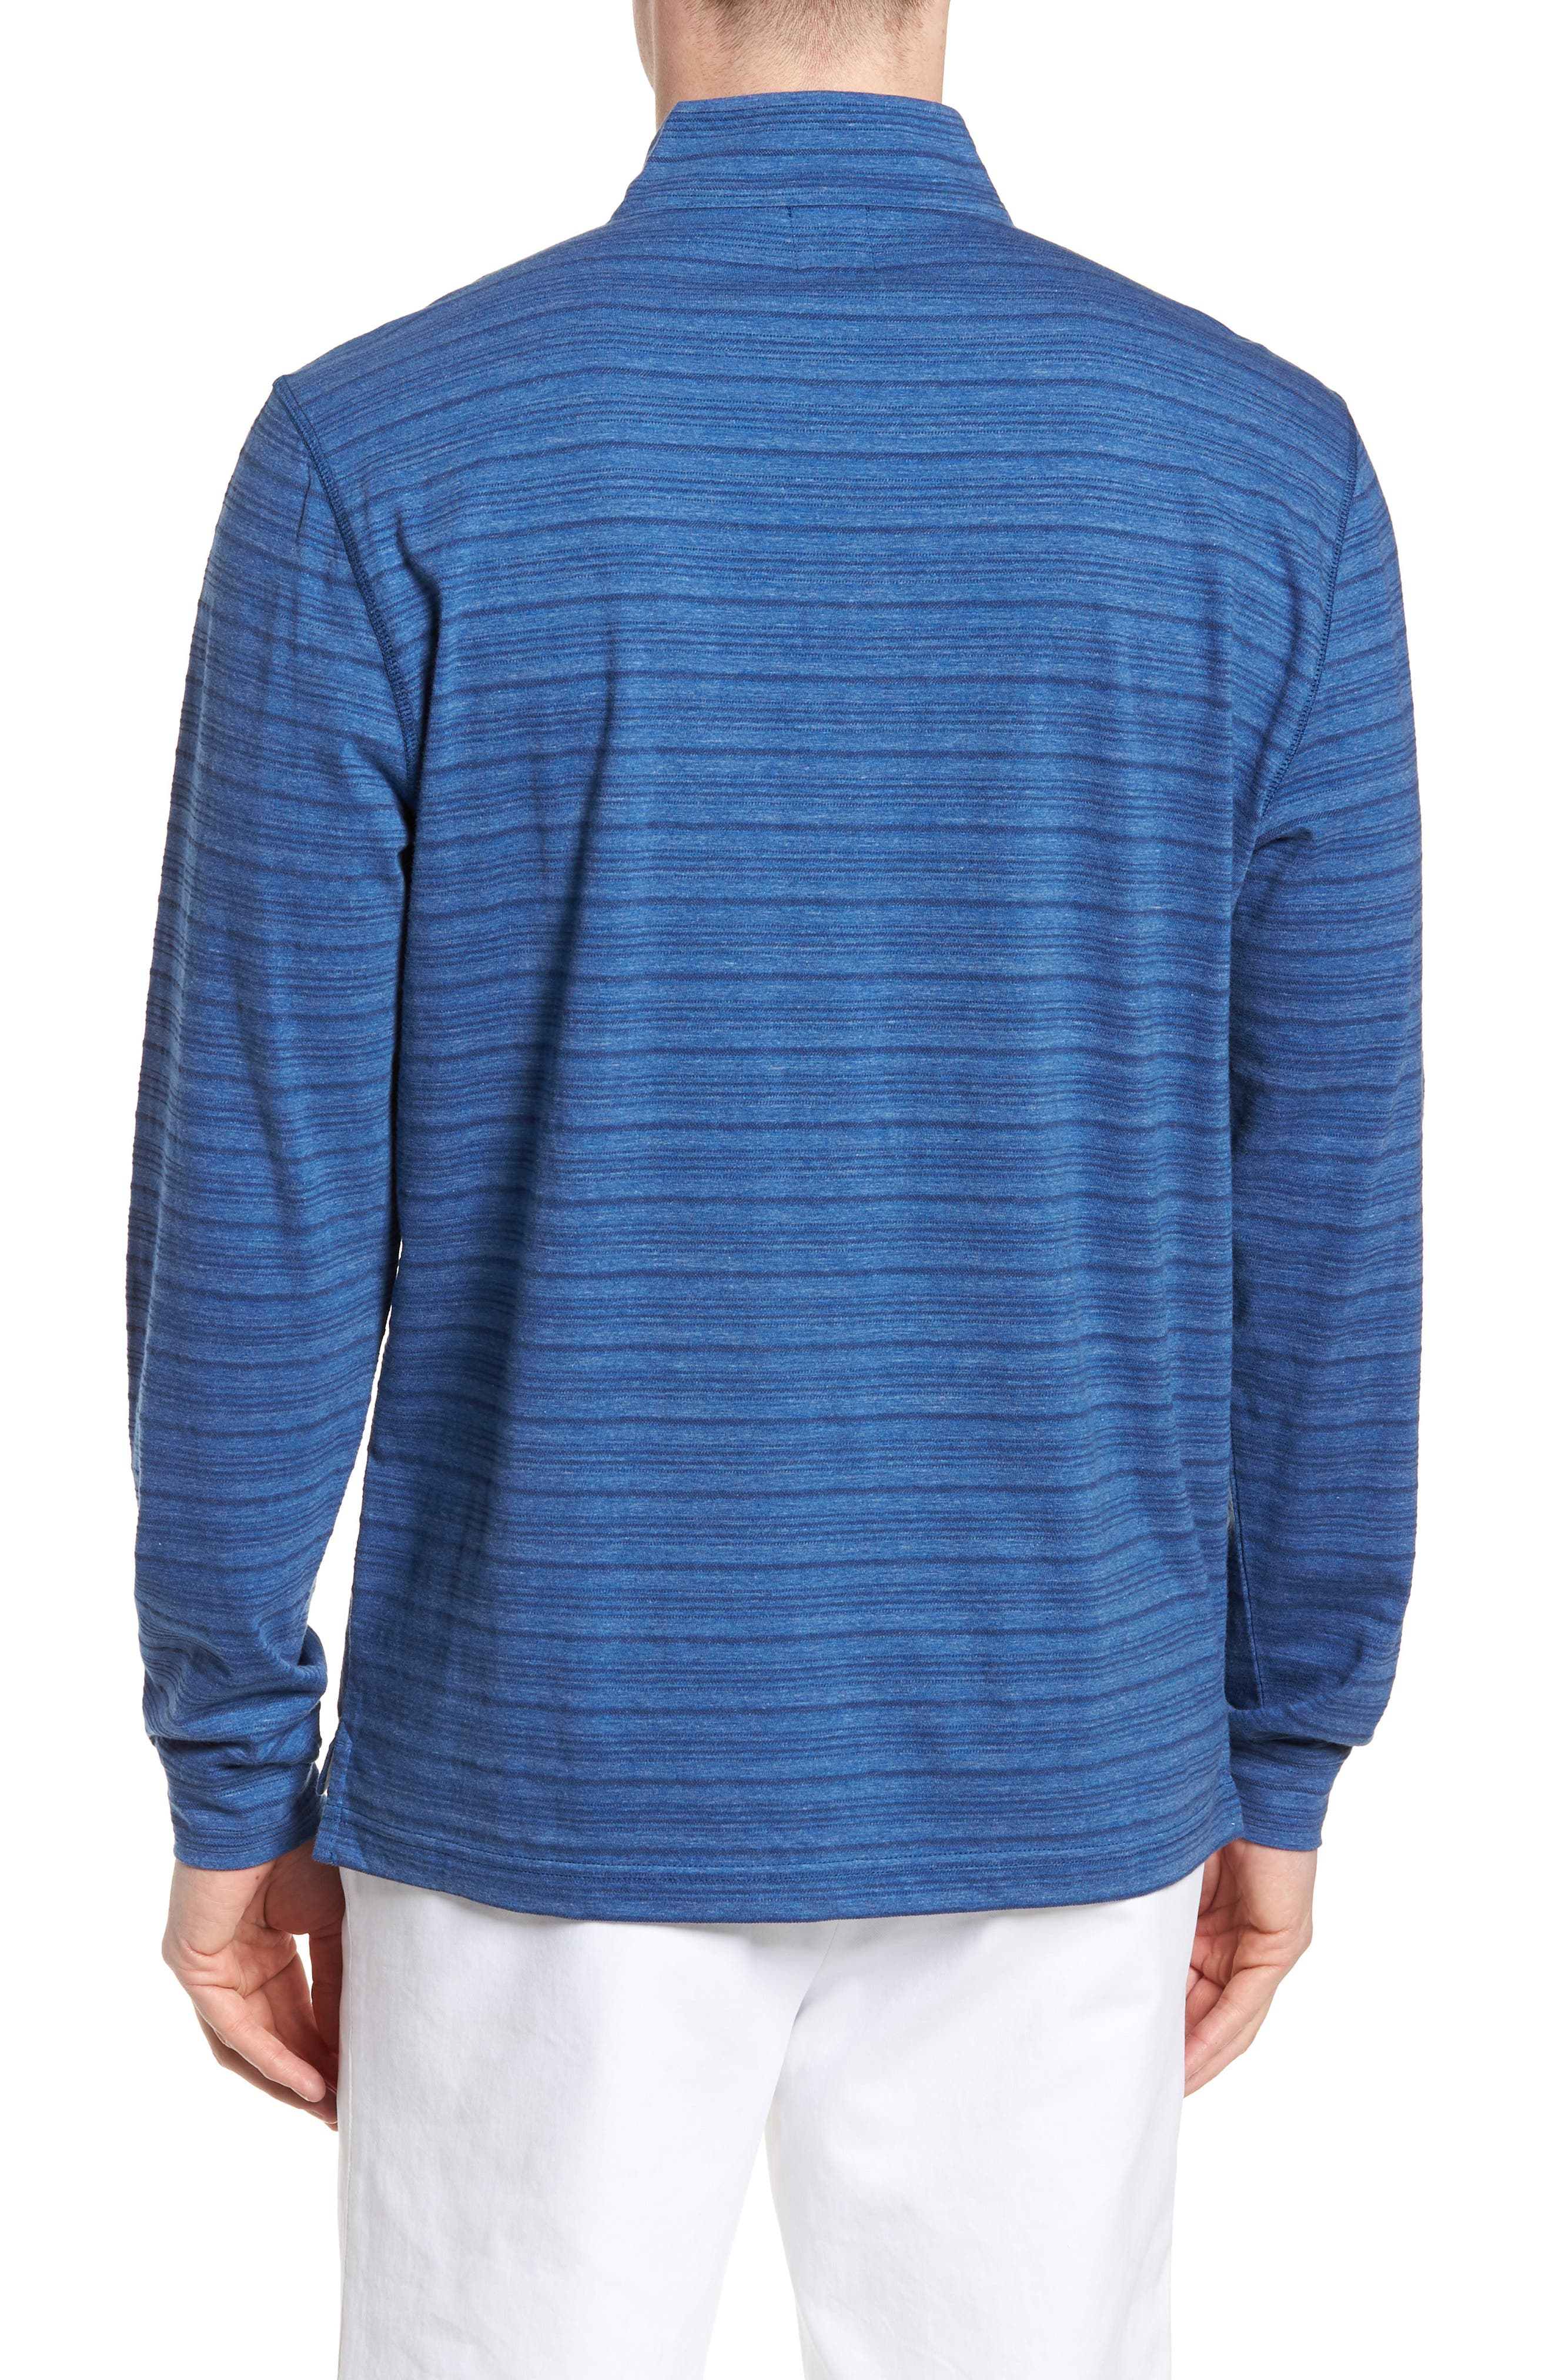 Calder Regular Fit T-Shirt,                             Alternate thumbnail 2, color,                             200